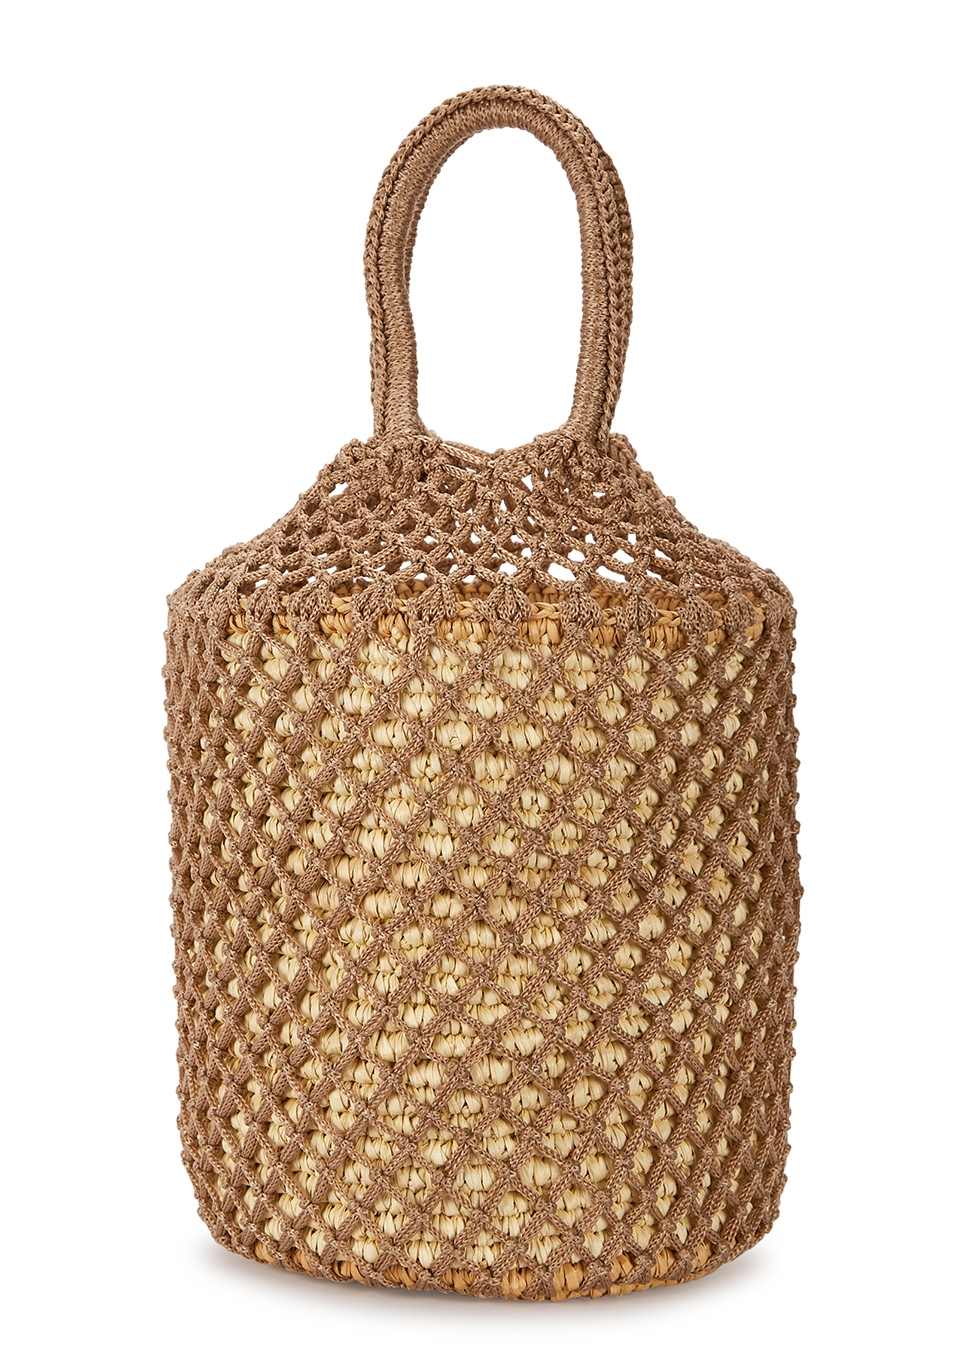 Straw and macramé bucket bag - Sensi Studio